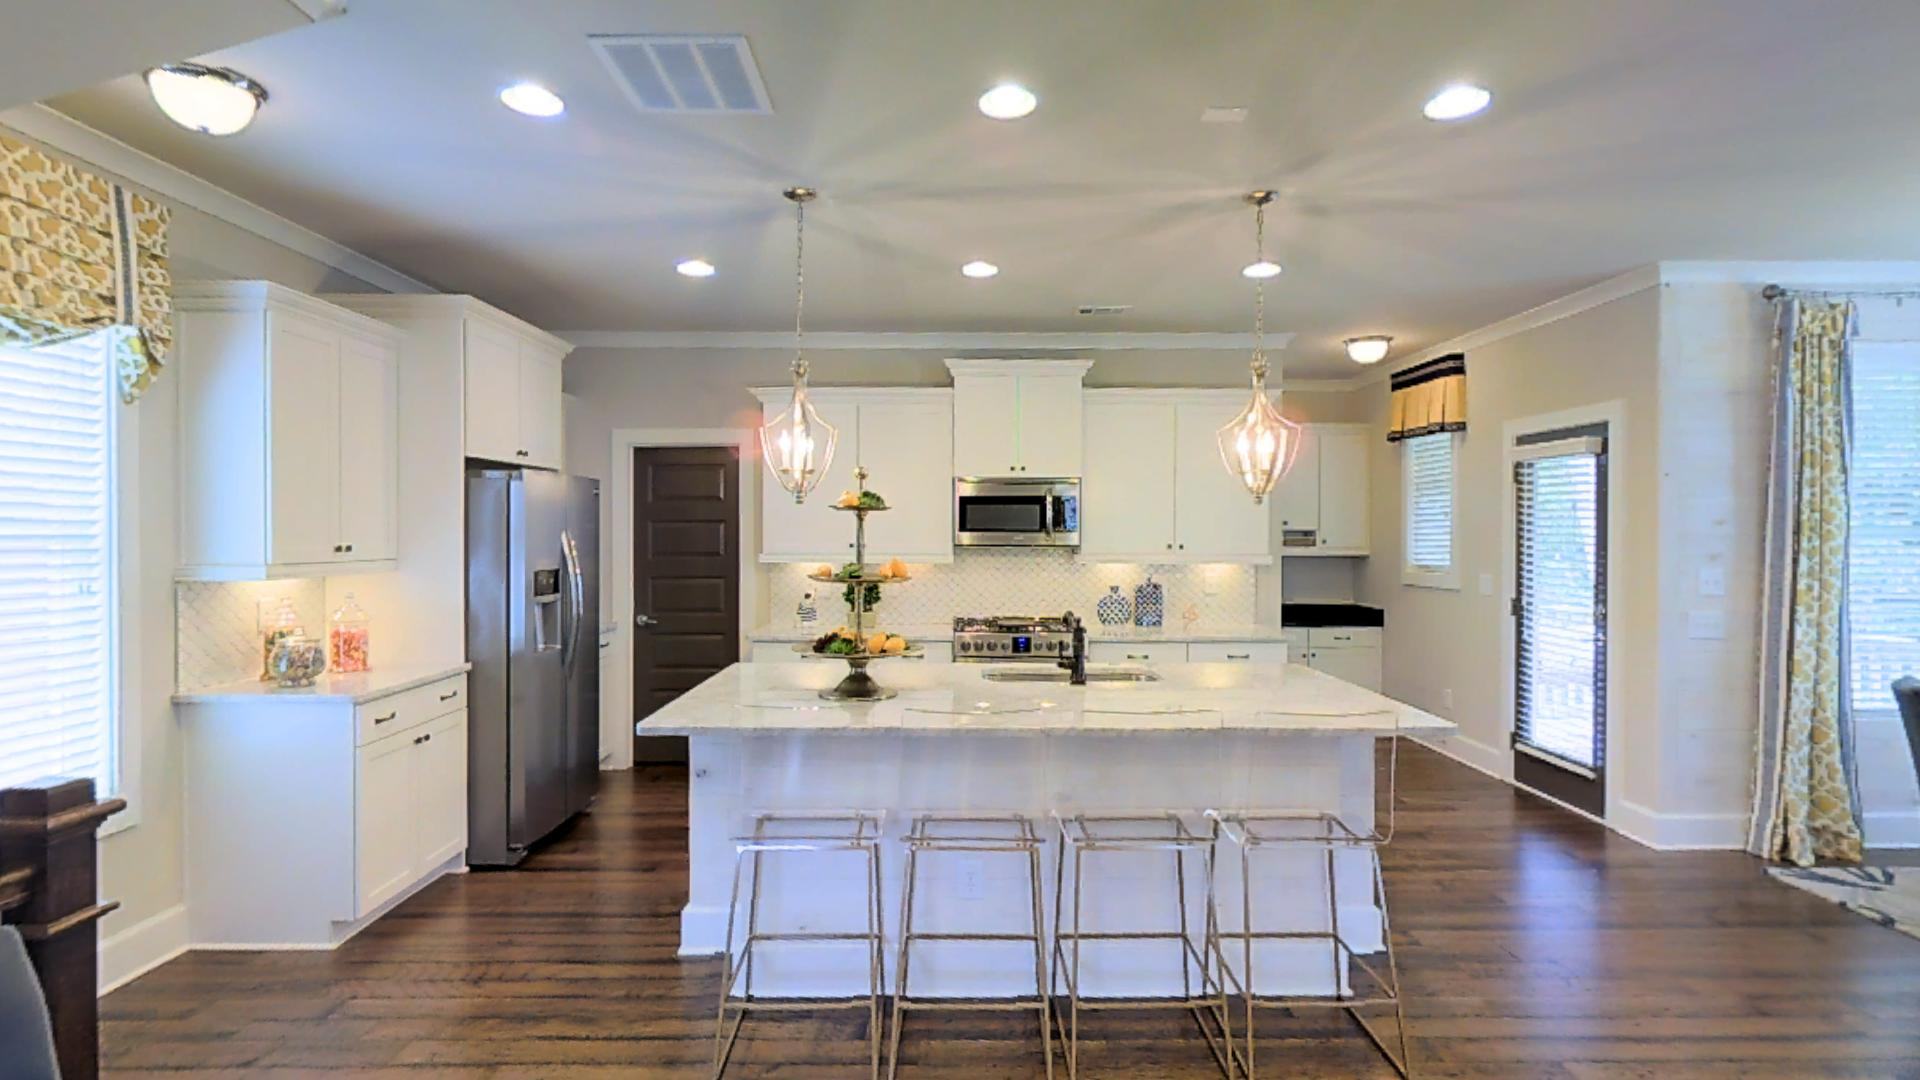 CORE Homebuilders: The Carrington Plan by Core Homebuilders